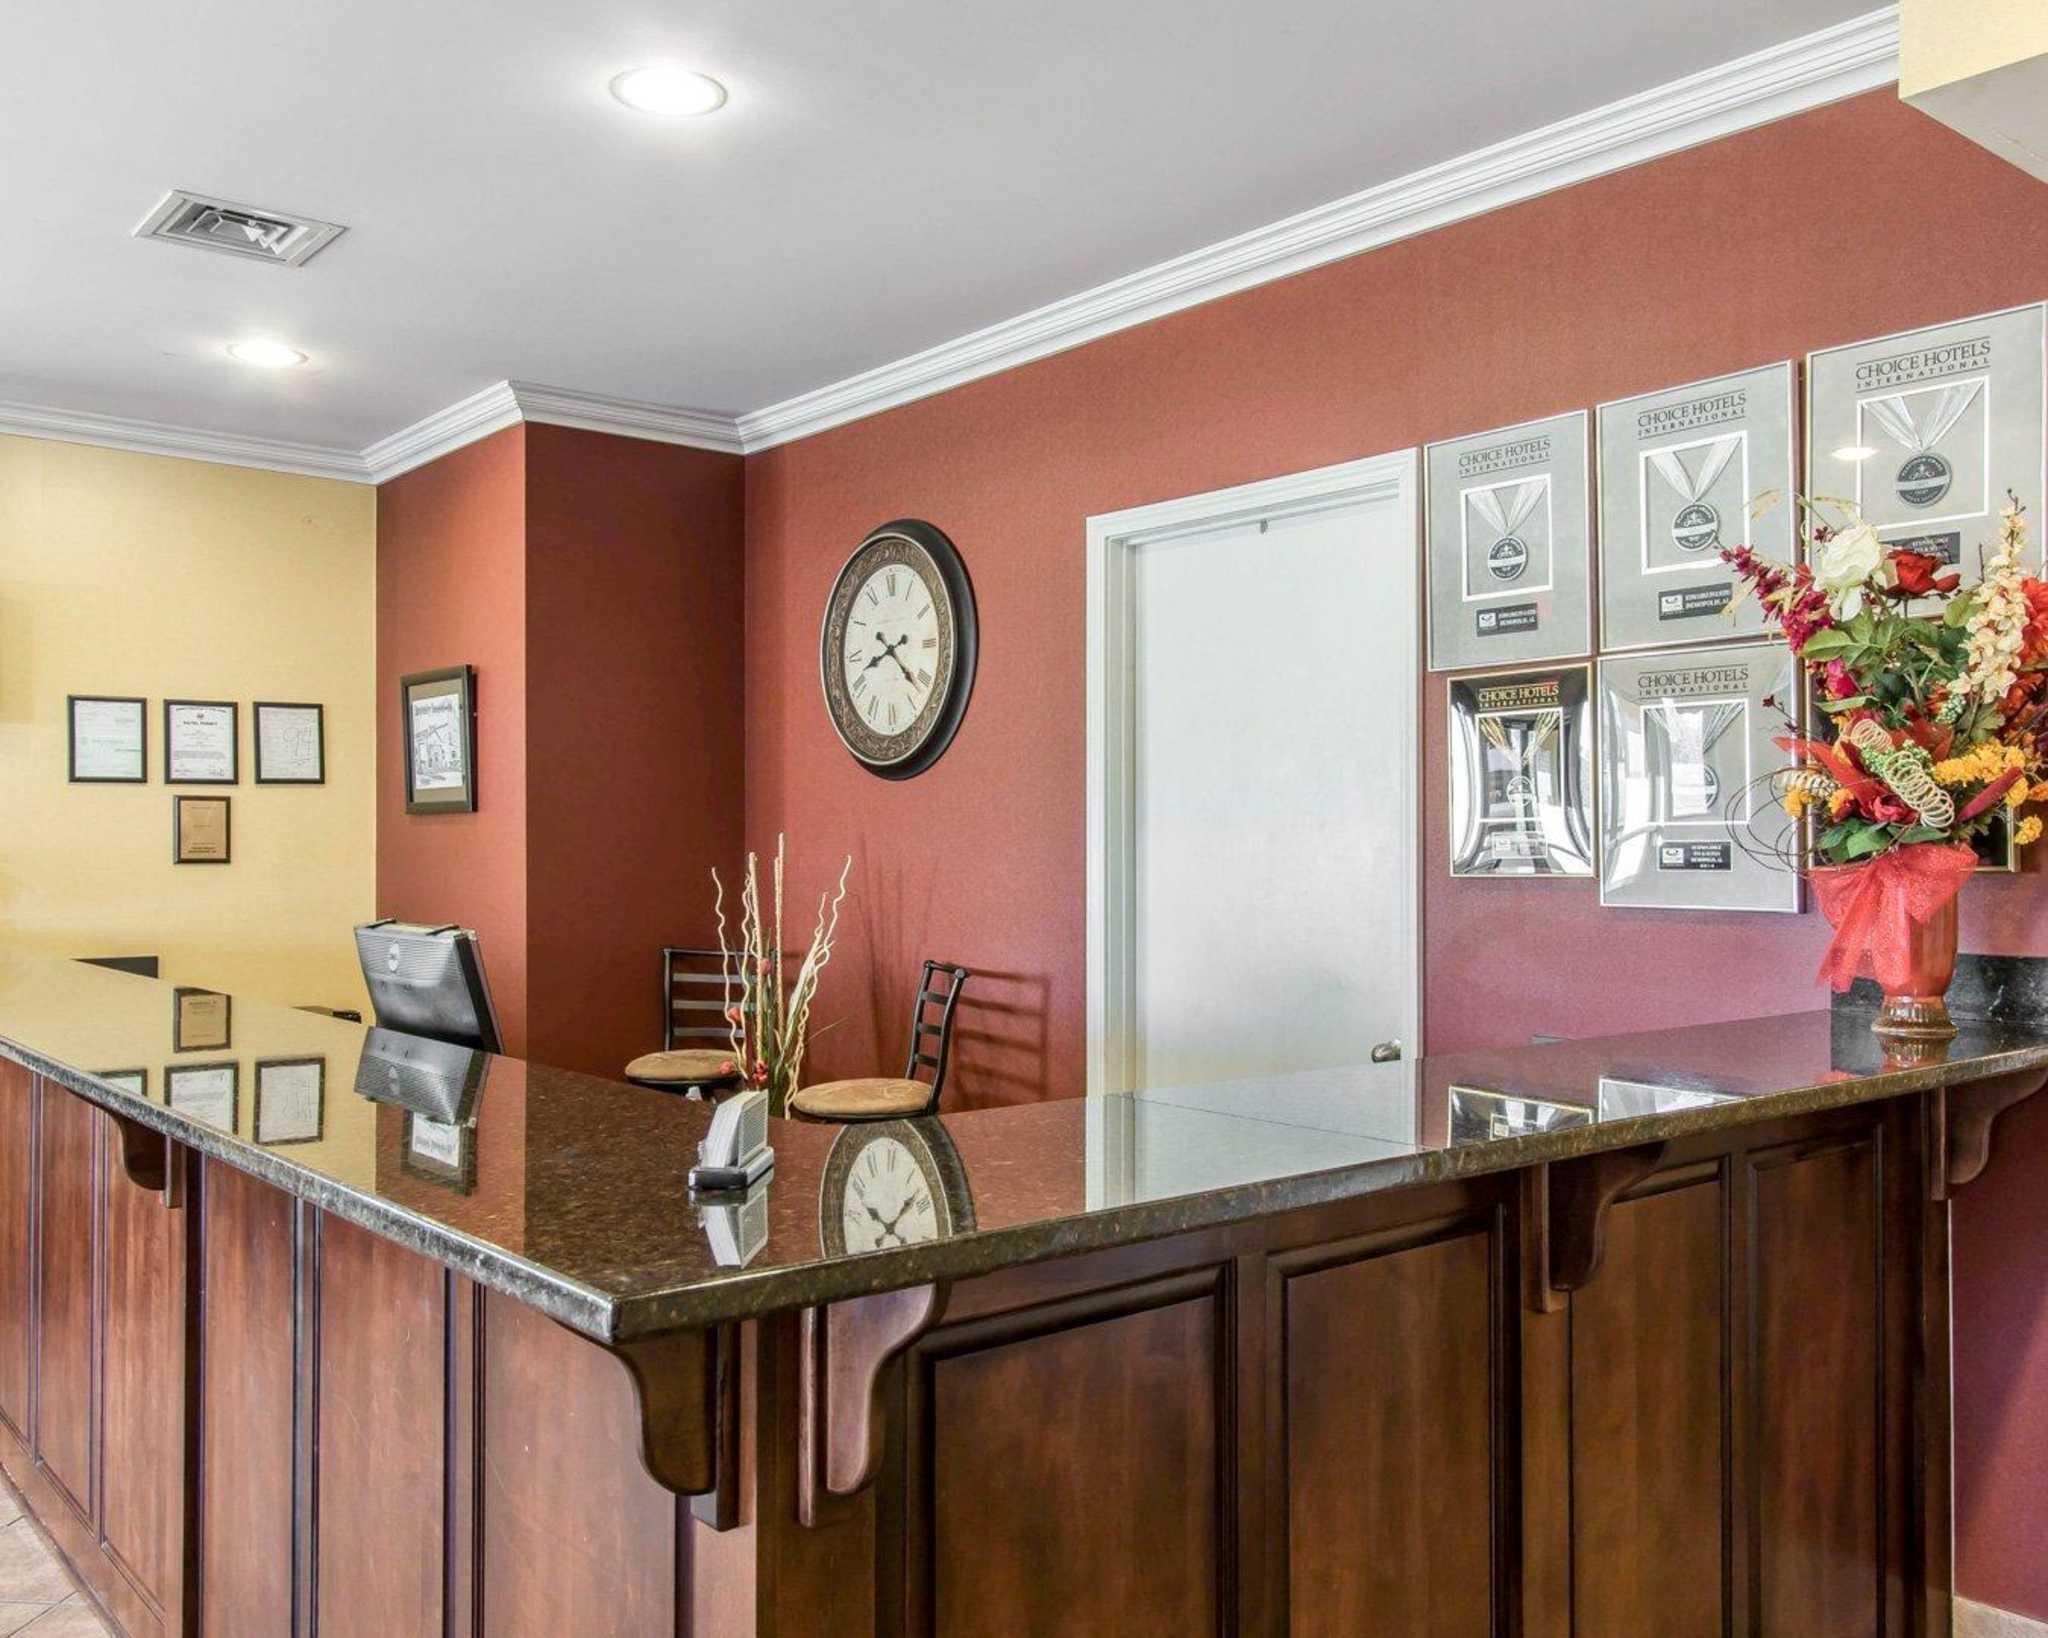 Econo Lodge Inn & Suites image 14